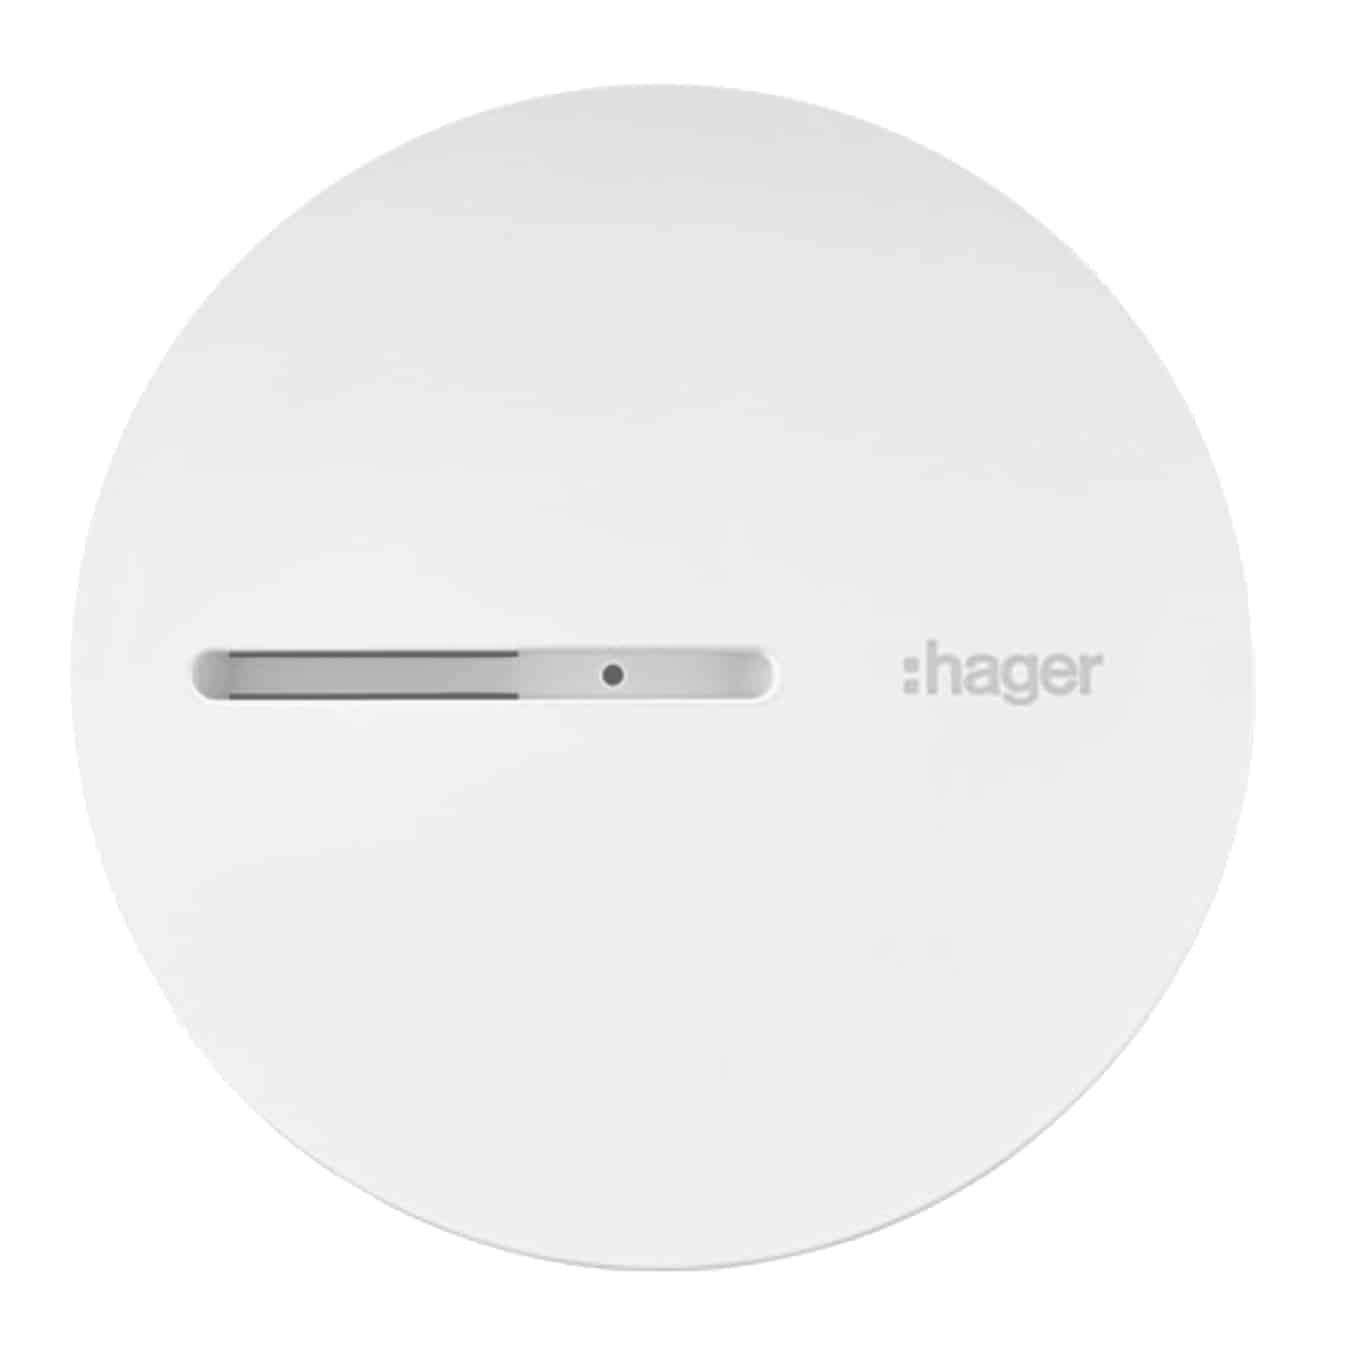 Koop Hager TG600AL Rookmelder